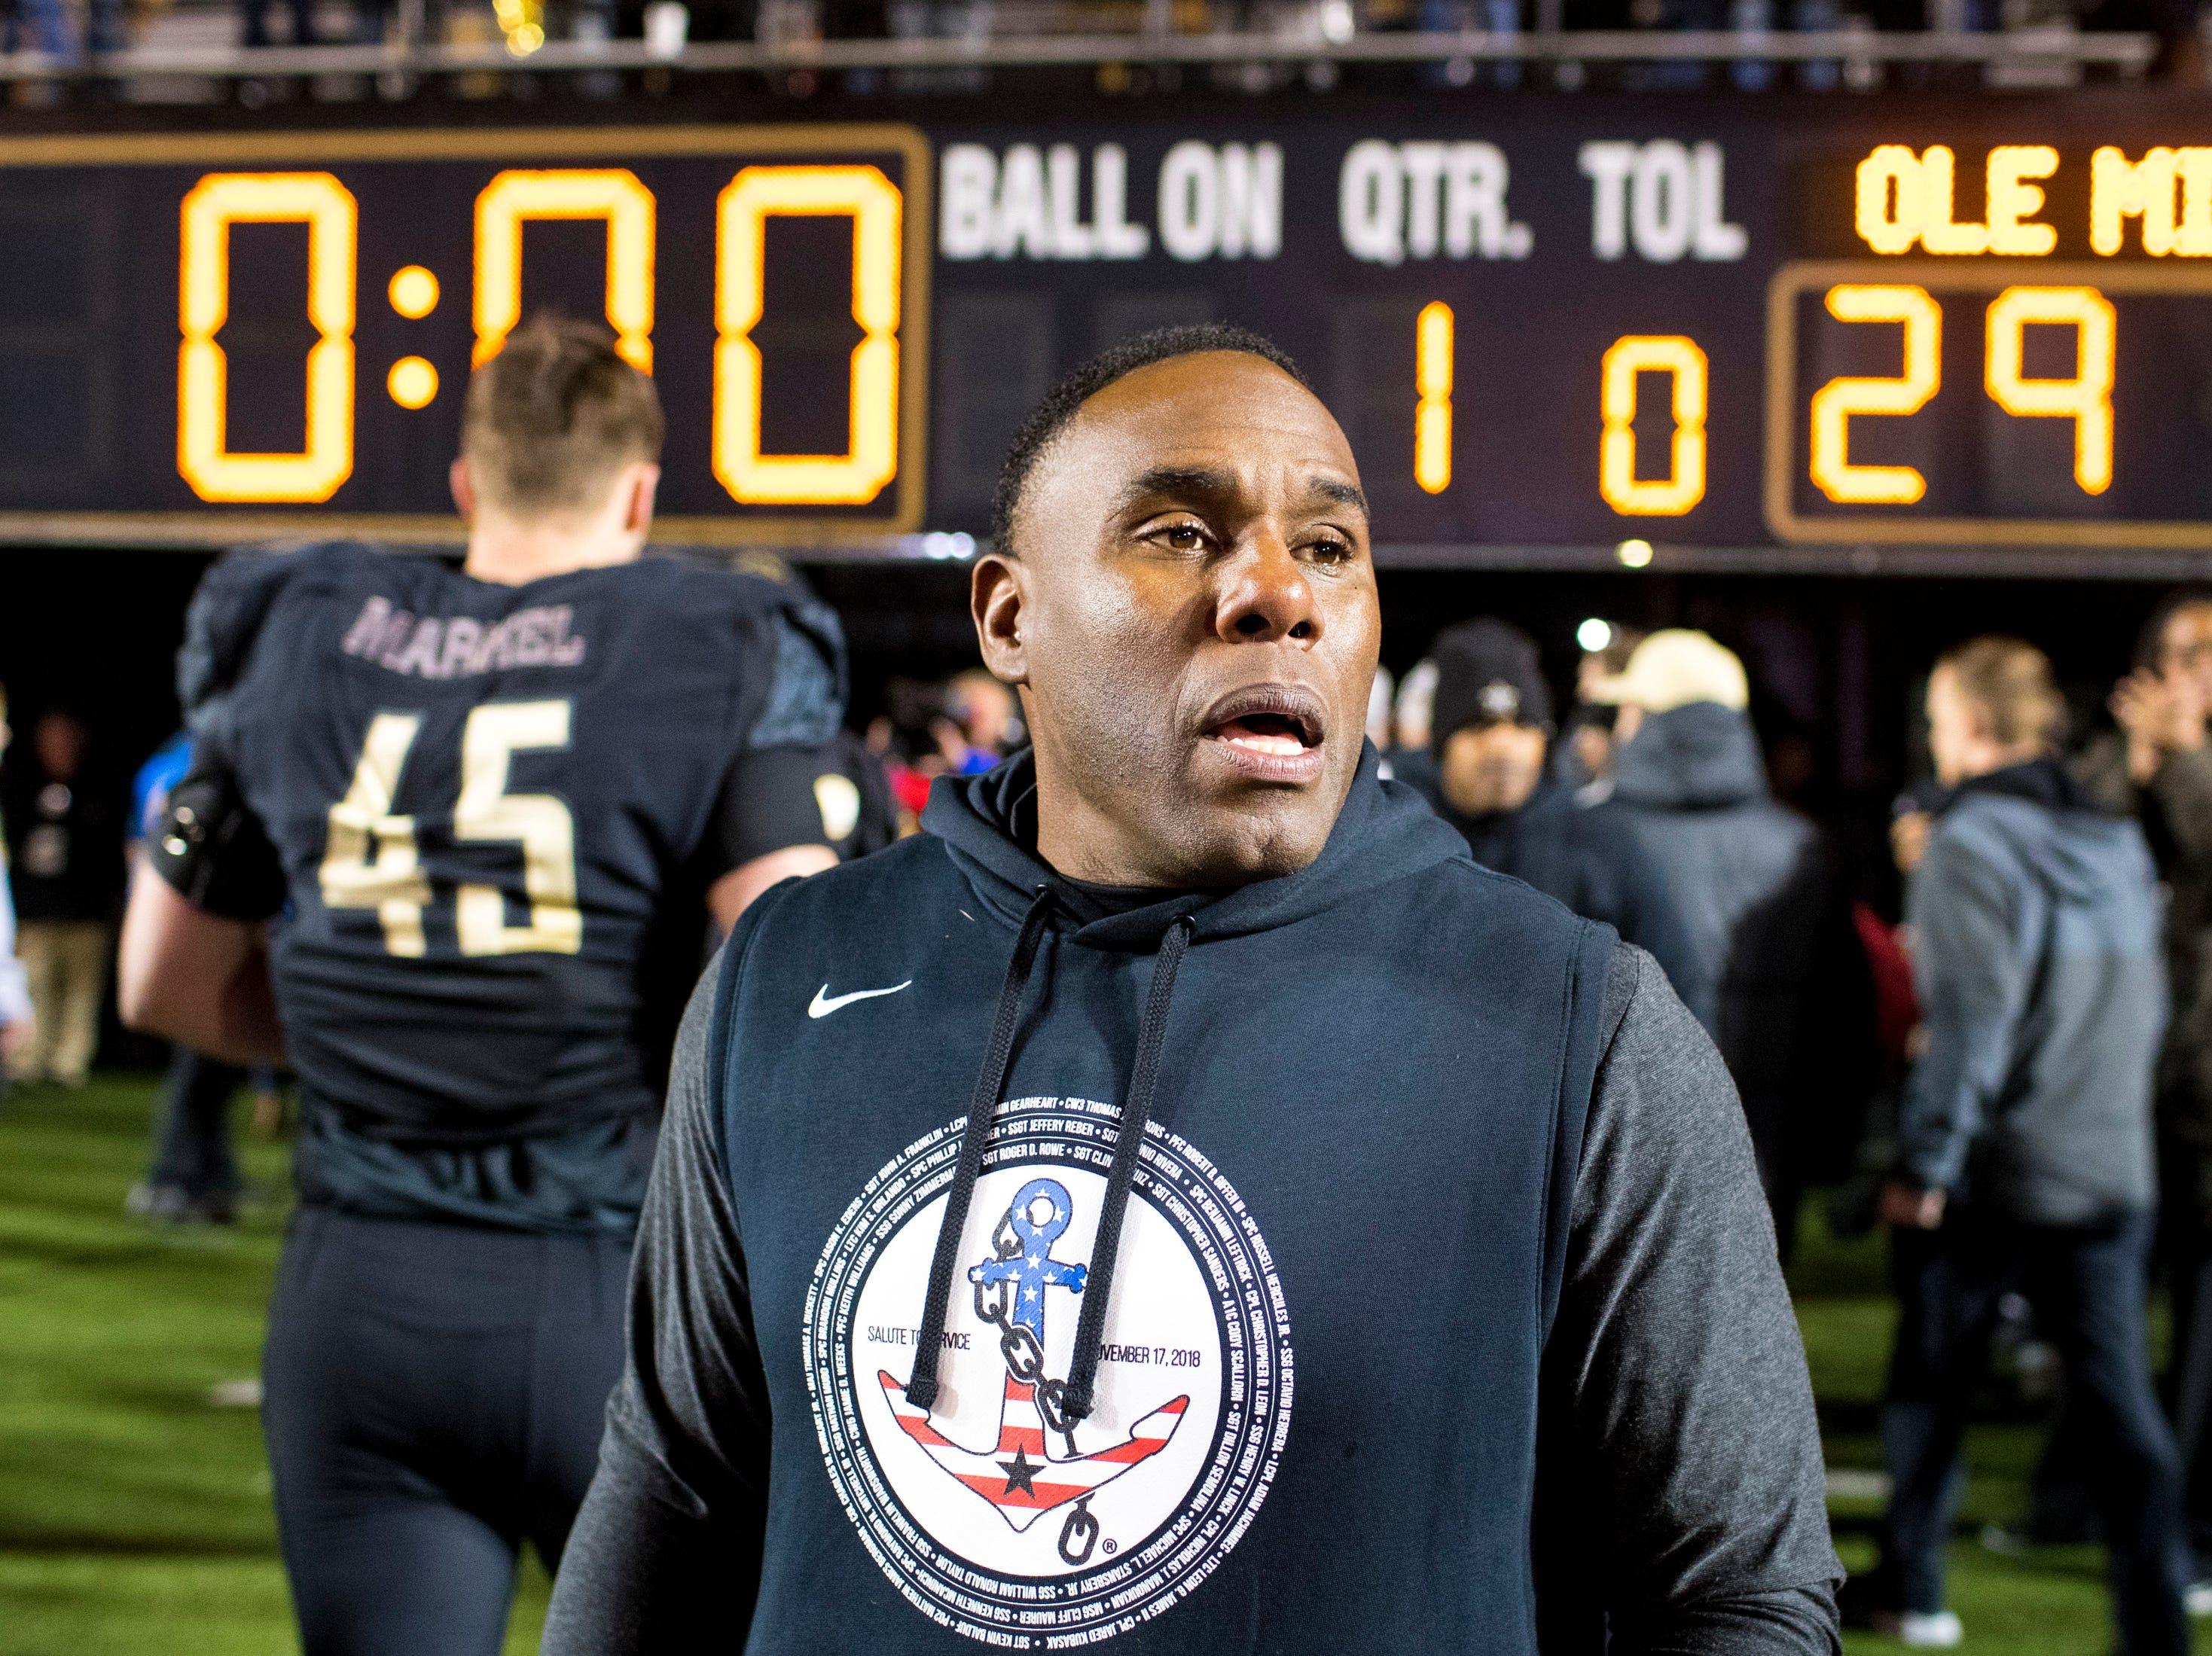 Vanderbilt head coach Derek Mason after Vanderbilt's game against Ole Miss at Vanderbilt Stadium in Nashville on Saturday, Nov. 17, 2018.